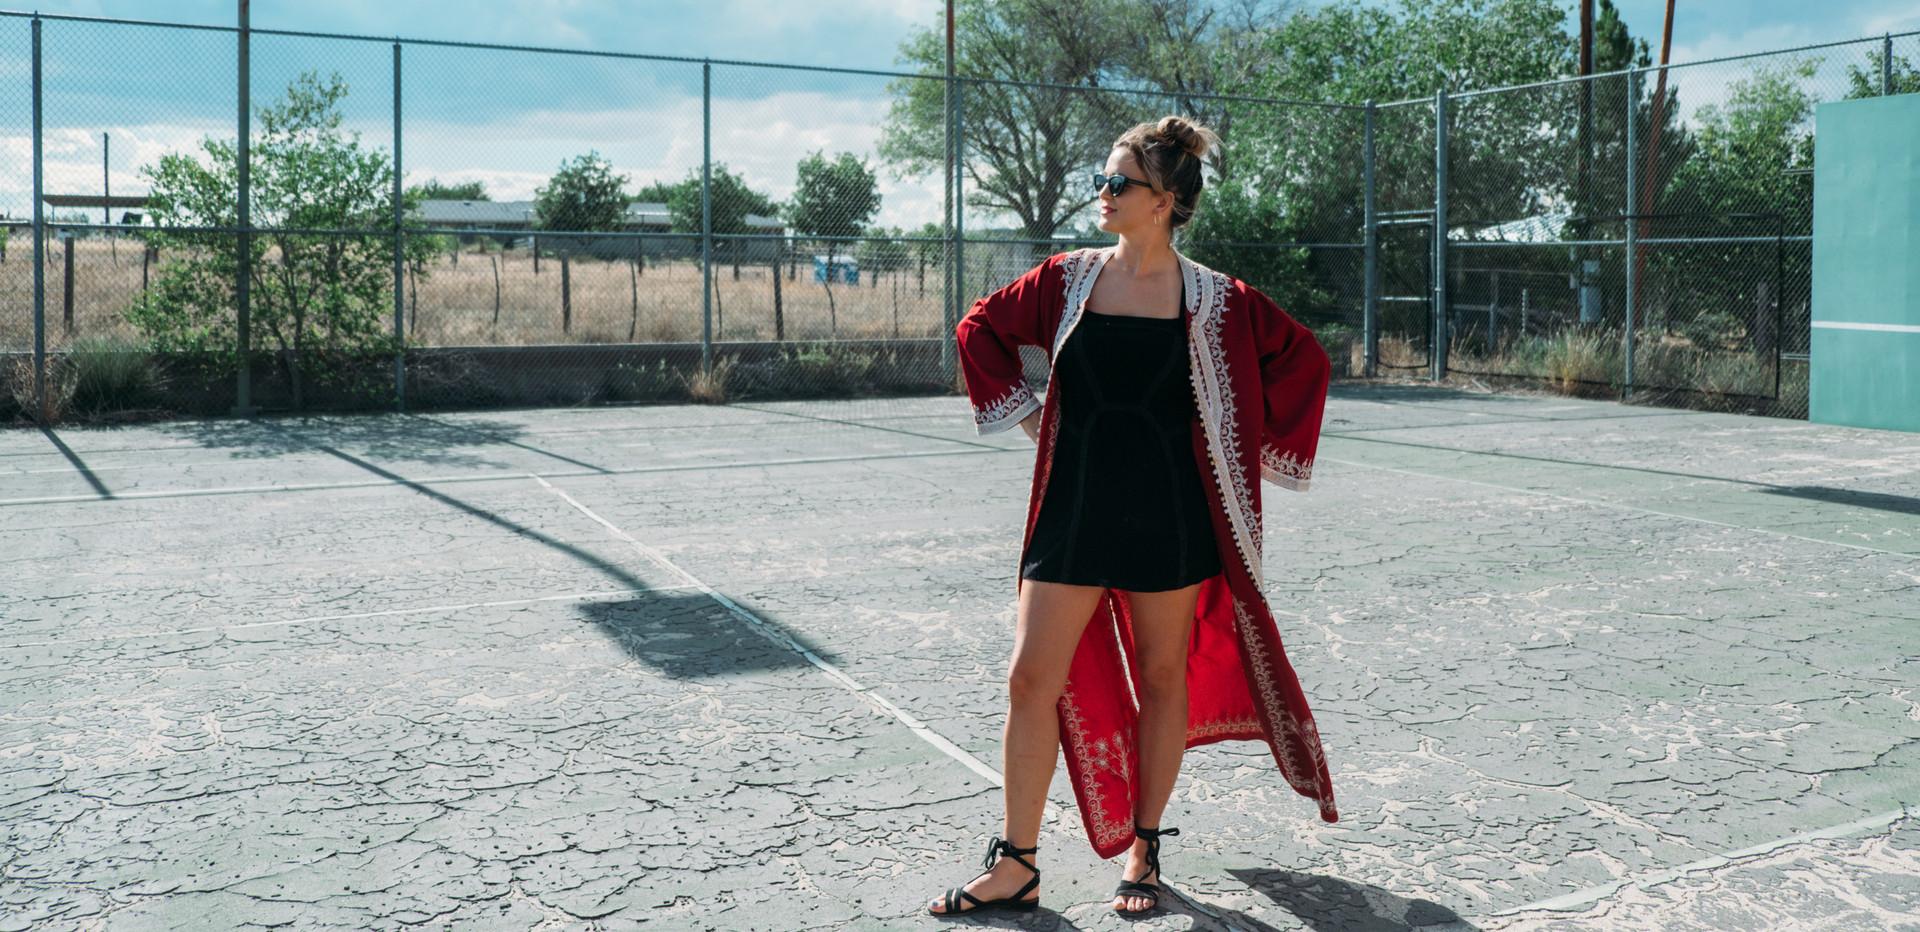 Photo by Sarah Vasquez.